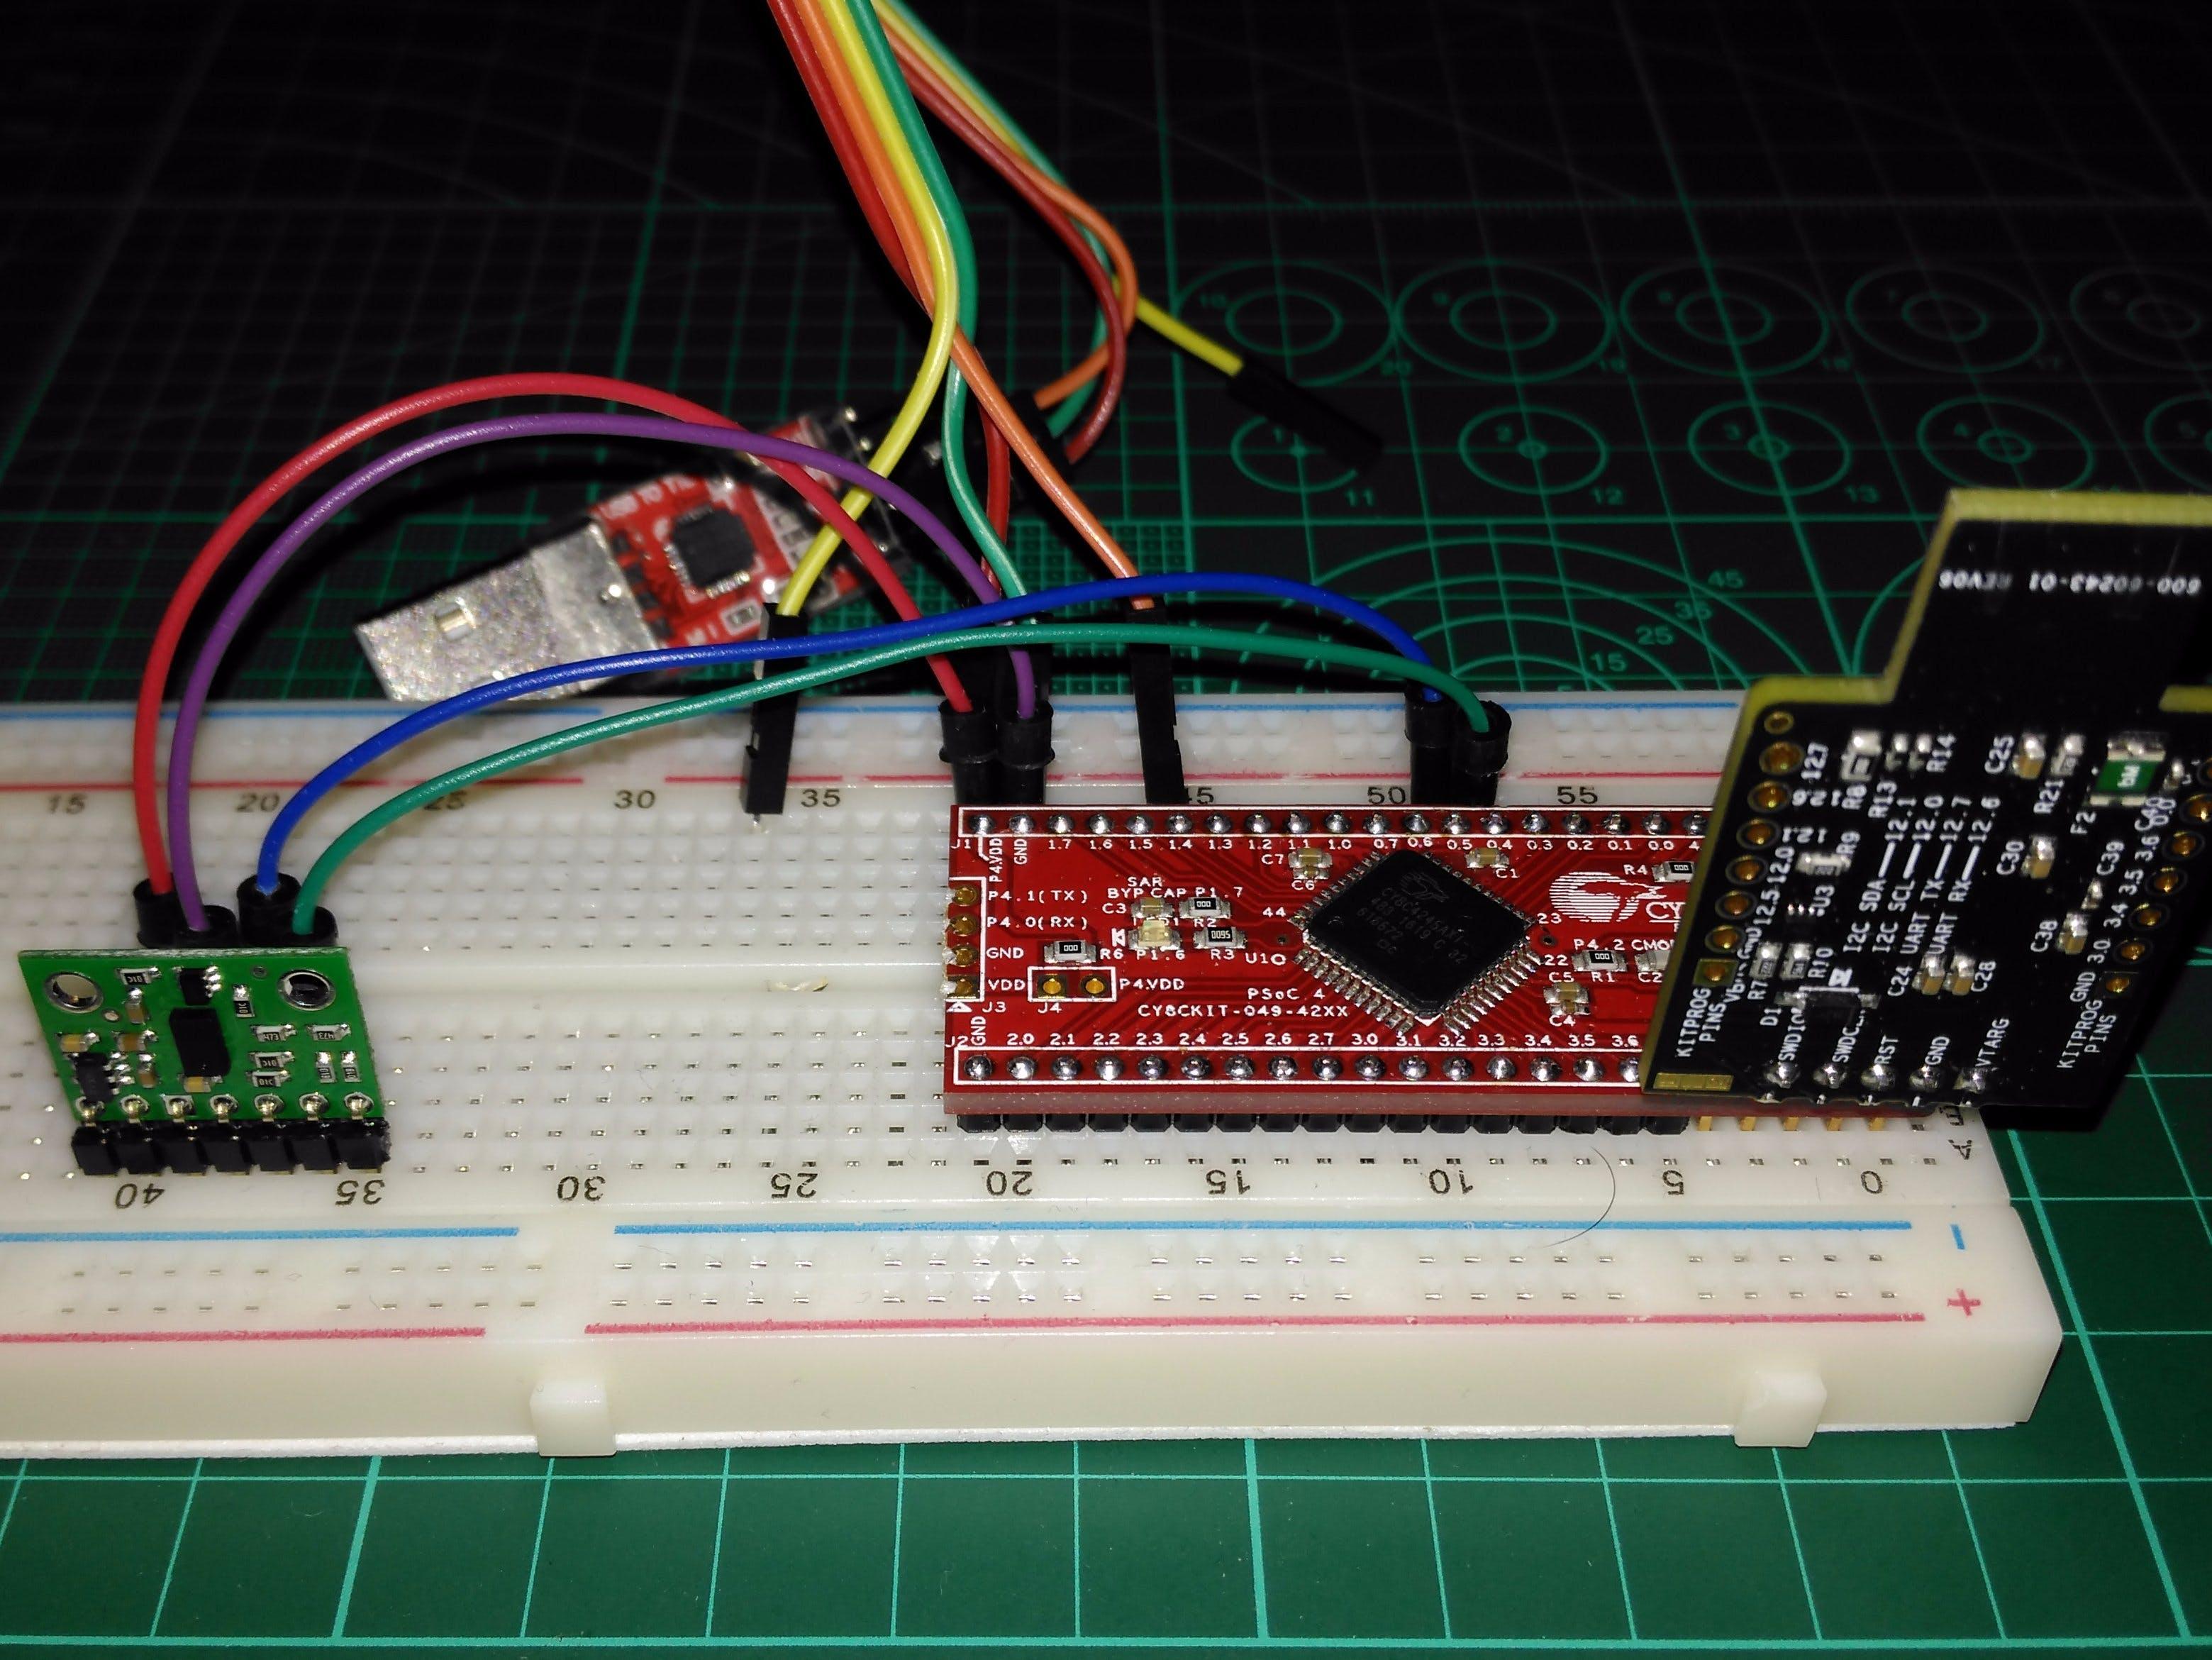 Measuring Distance With VL53L0X ToF Sensor